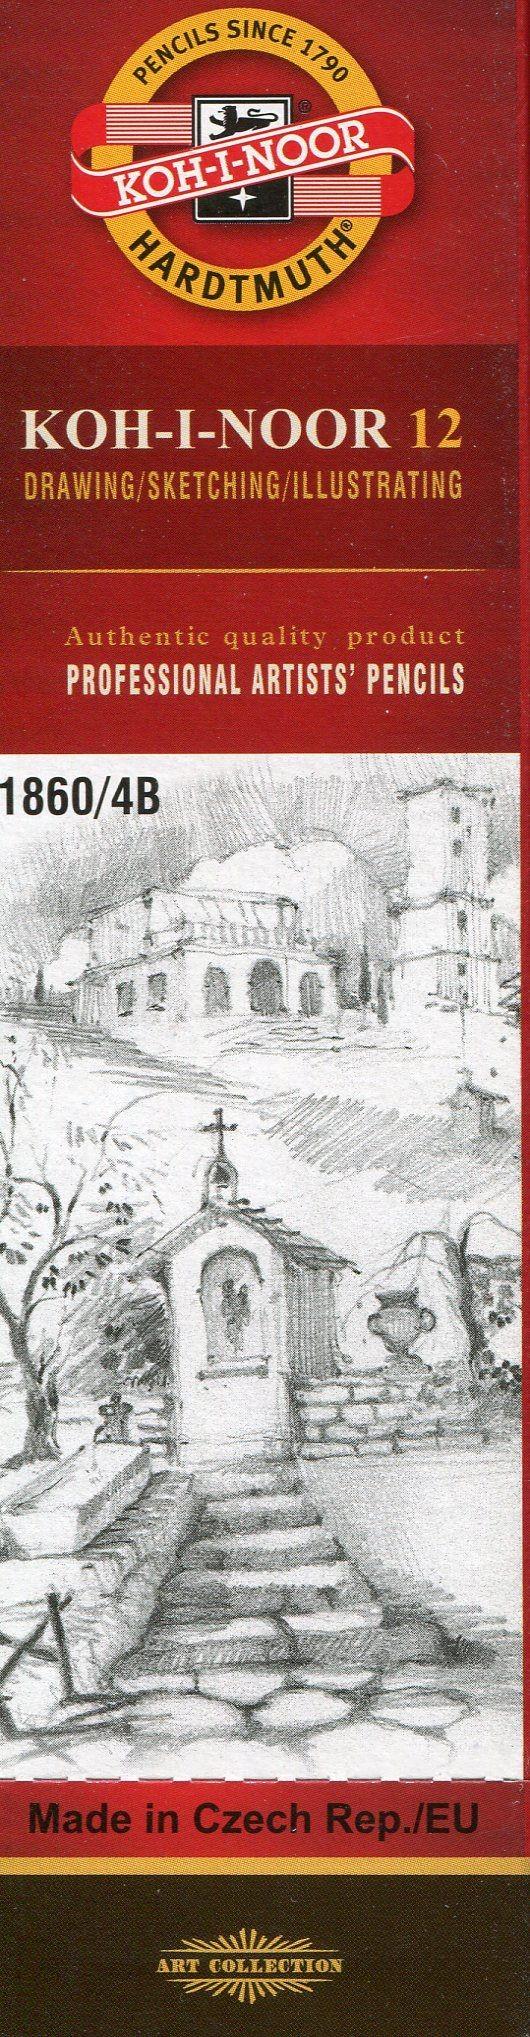 Koh-I-Noor Koh-I-Noor Ołówek grafitowy 1860/4B 12 szt